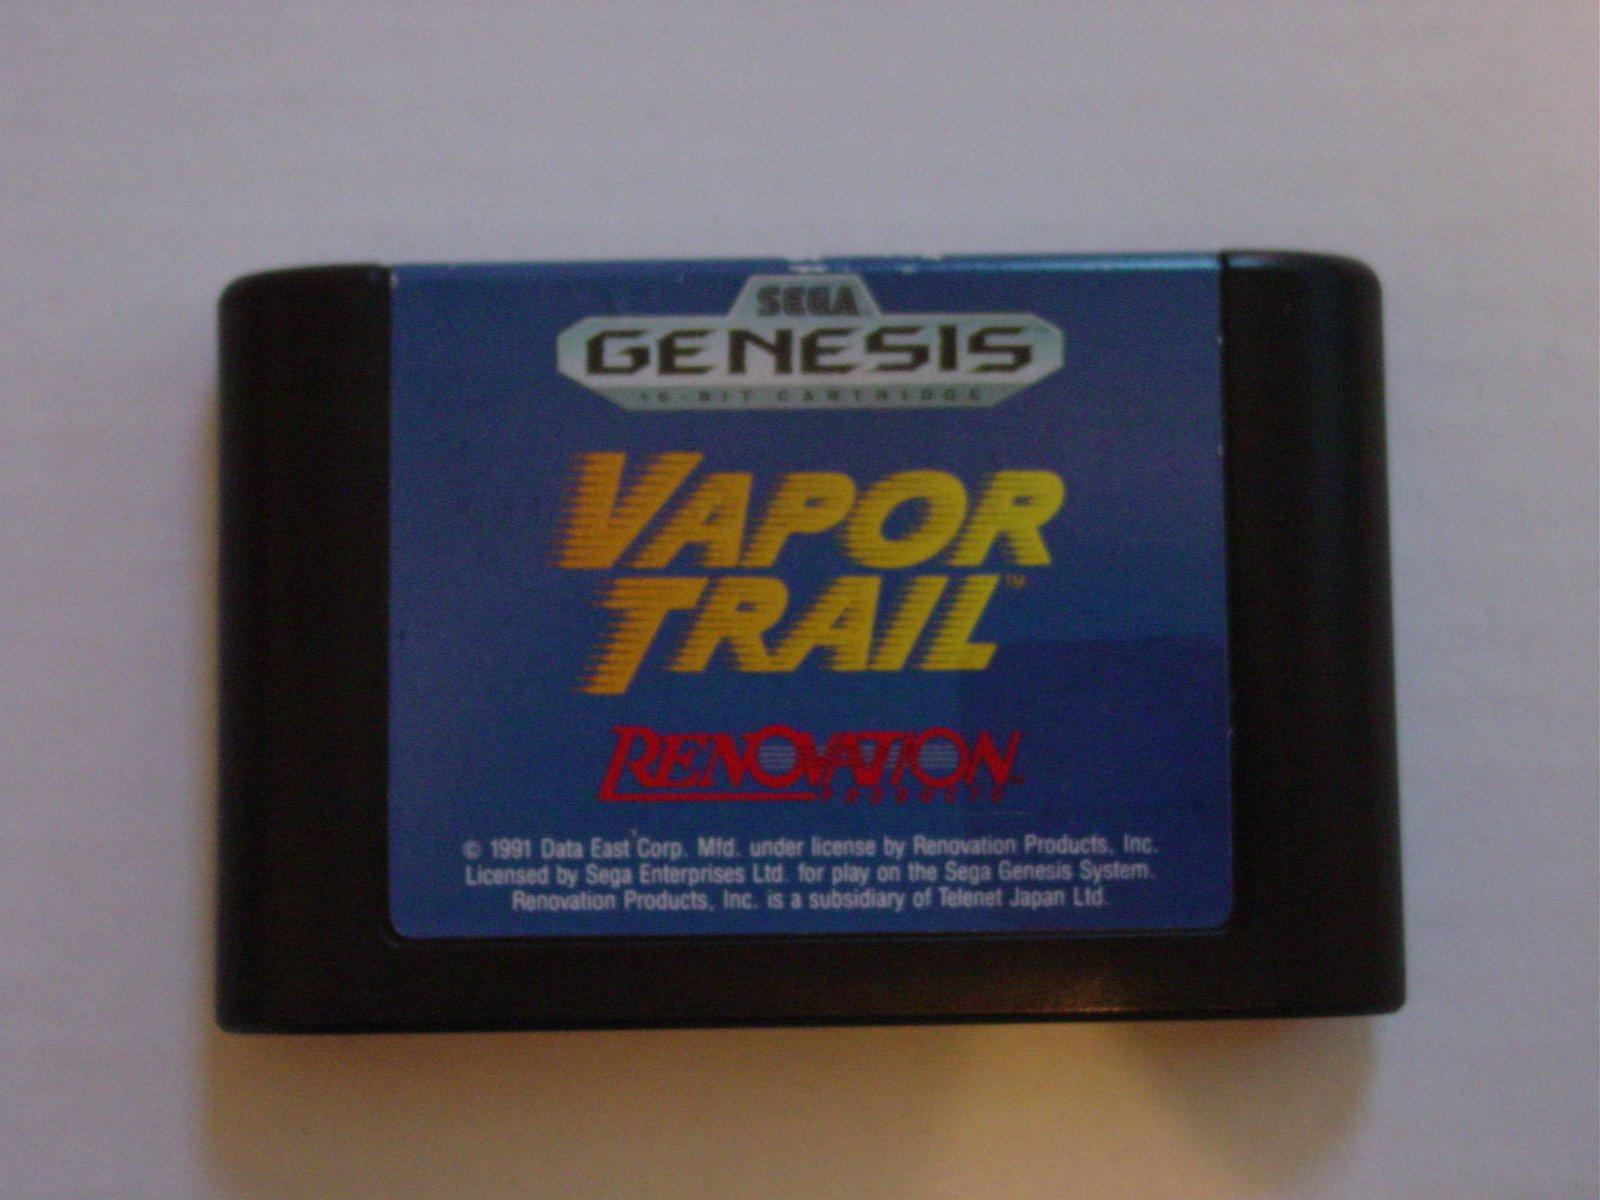 Amazon com: Vapor Trail - Sega Genesis: Video Games